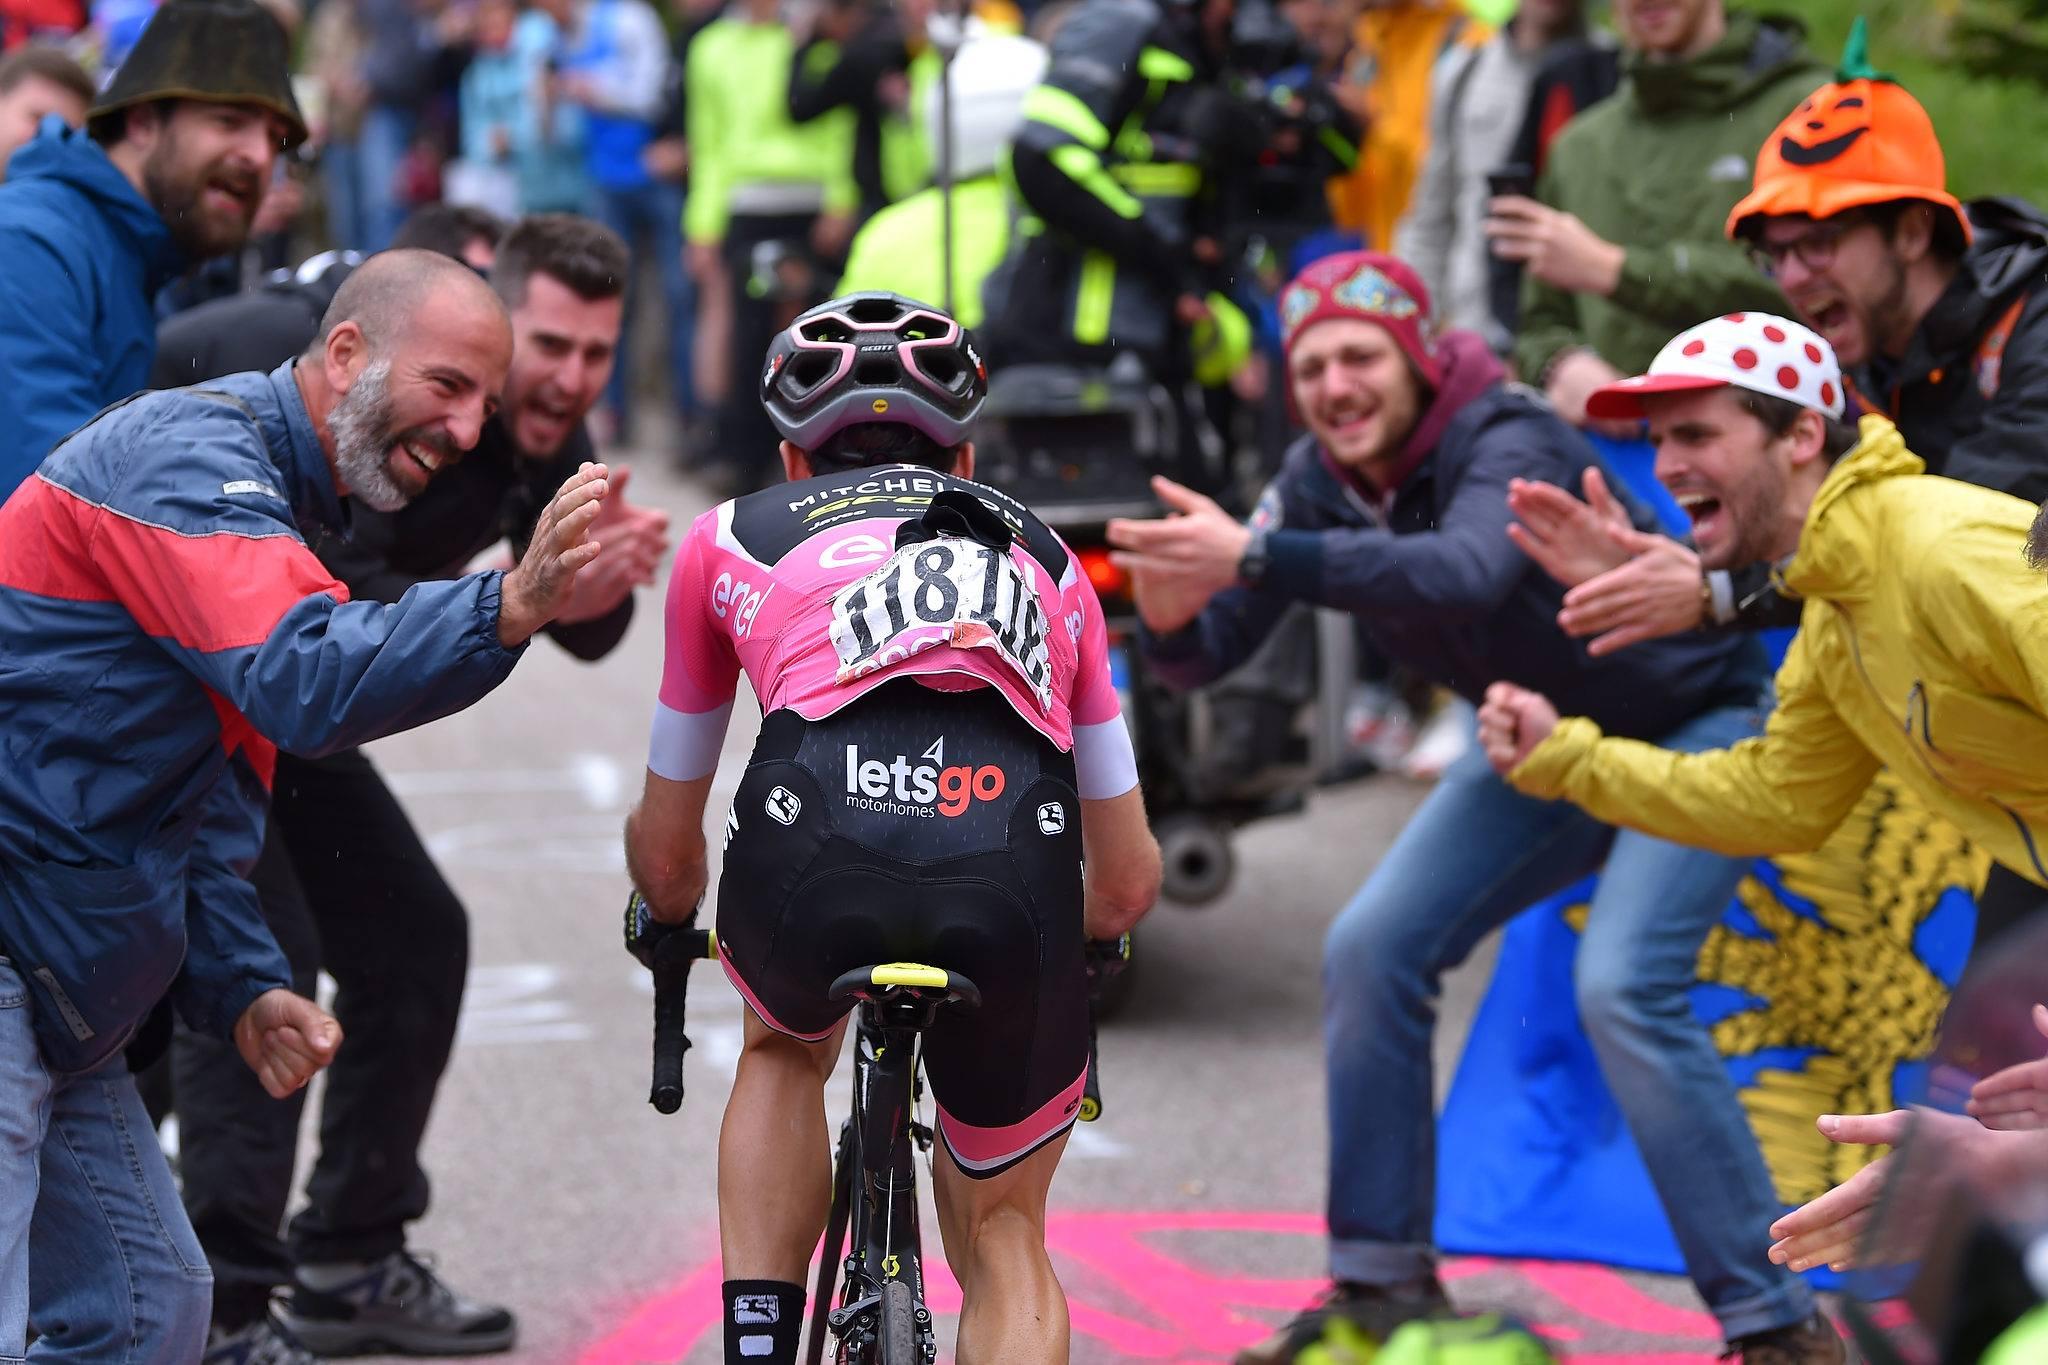 Giro de Italia - Simon Yates Zoncolan JoanSeguidor